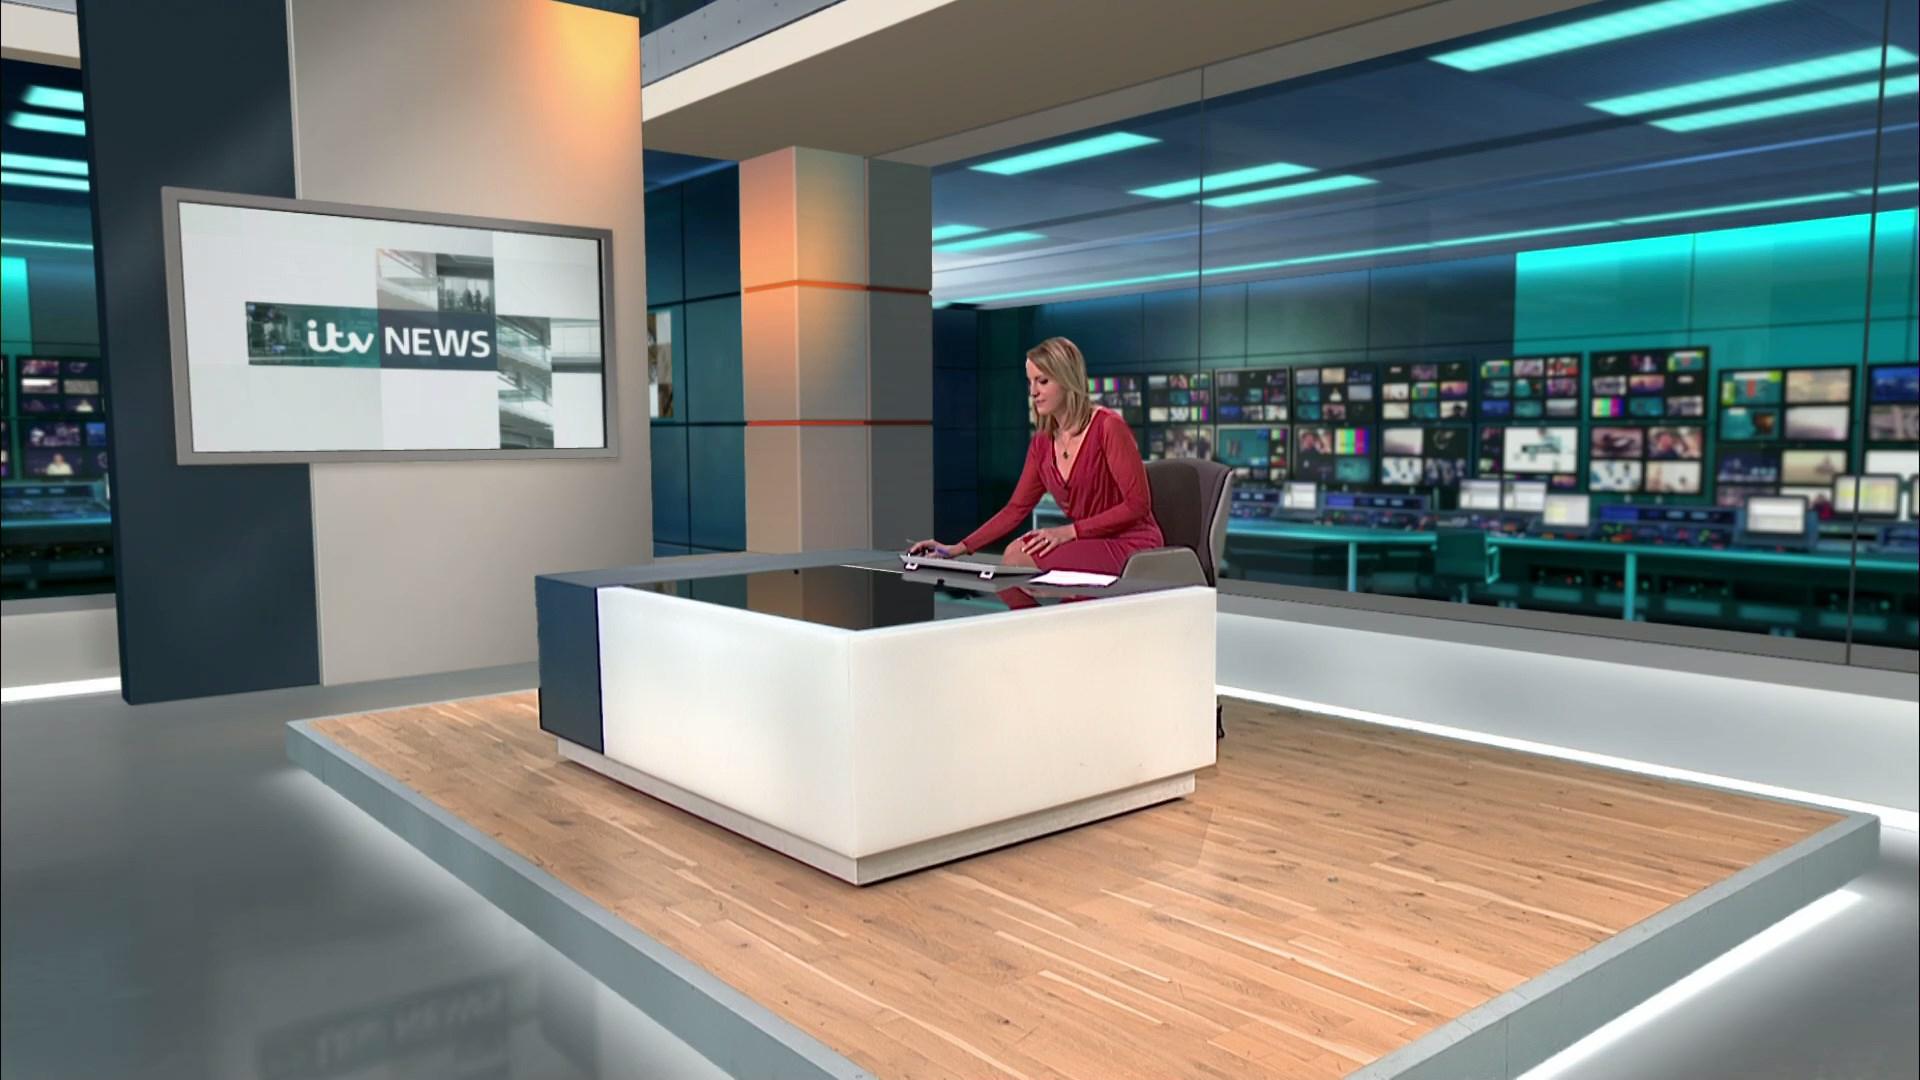 47920524_itv-news-london_20170729_18001805-ts_snapshot_22-32_-2017-07-29_18-58-10.jpg